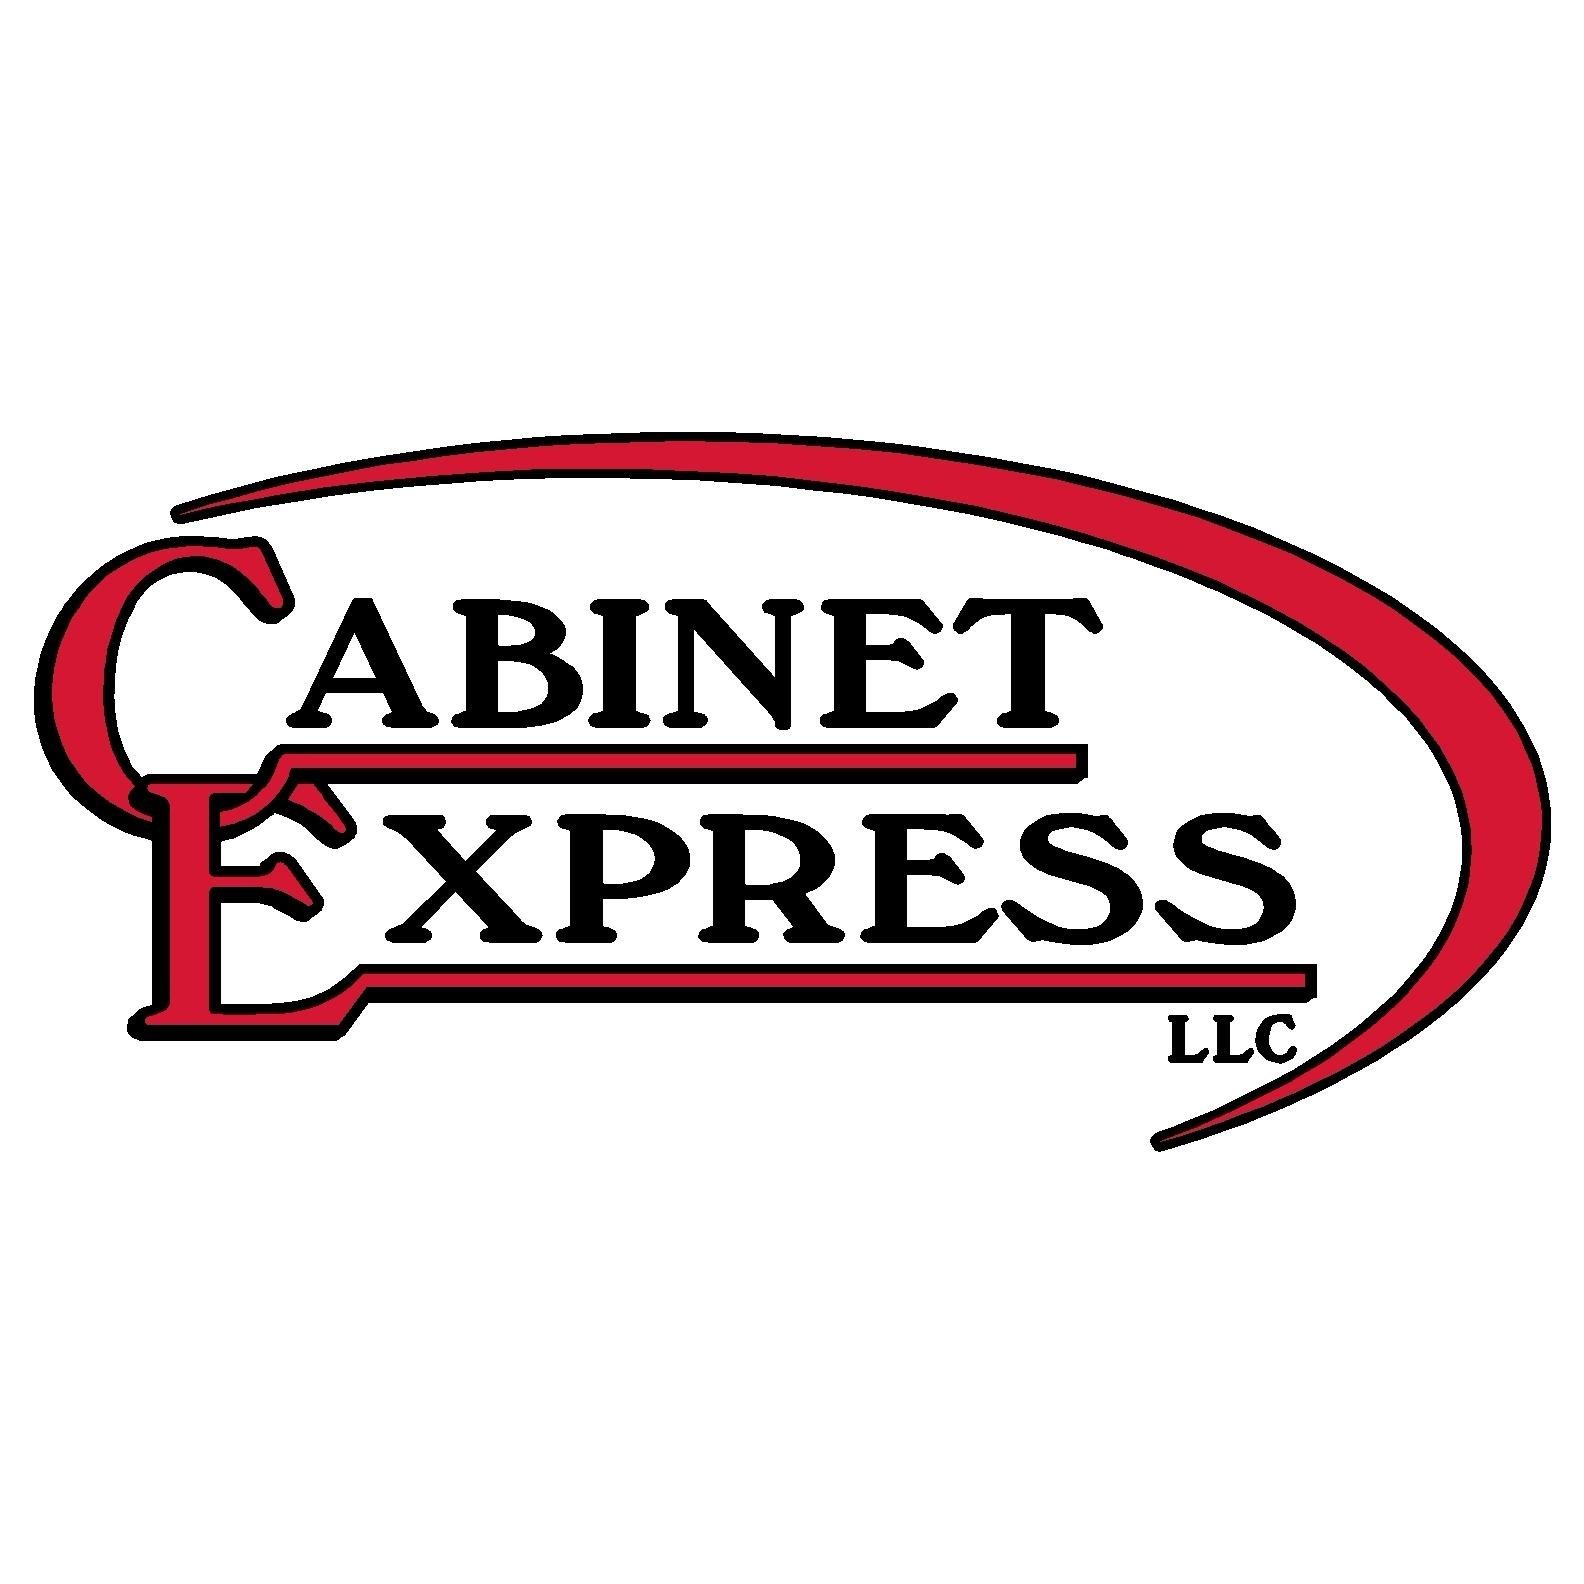 Cabinet Express LLC